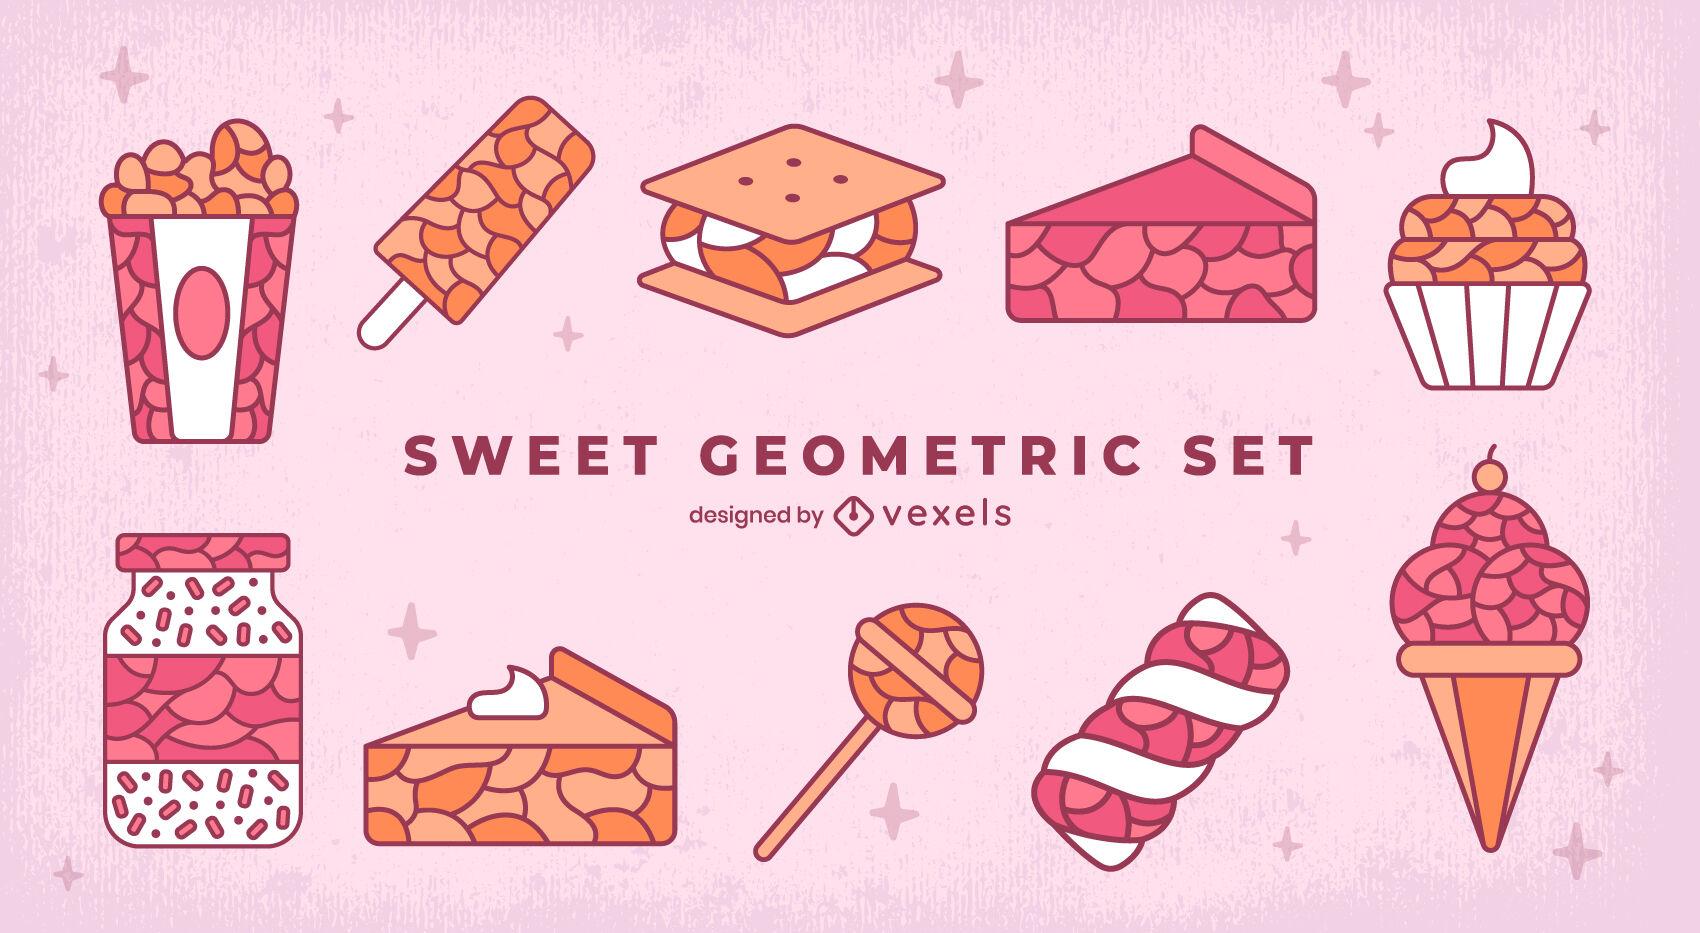 Conjunto de traços de cores geométricas de guloseimas doces